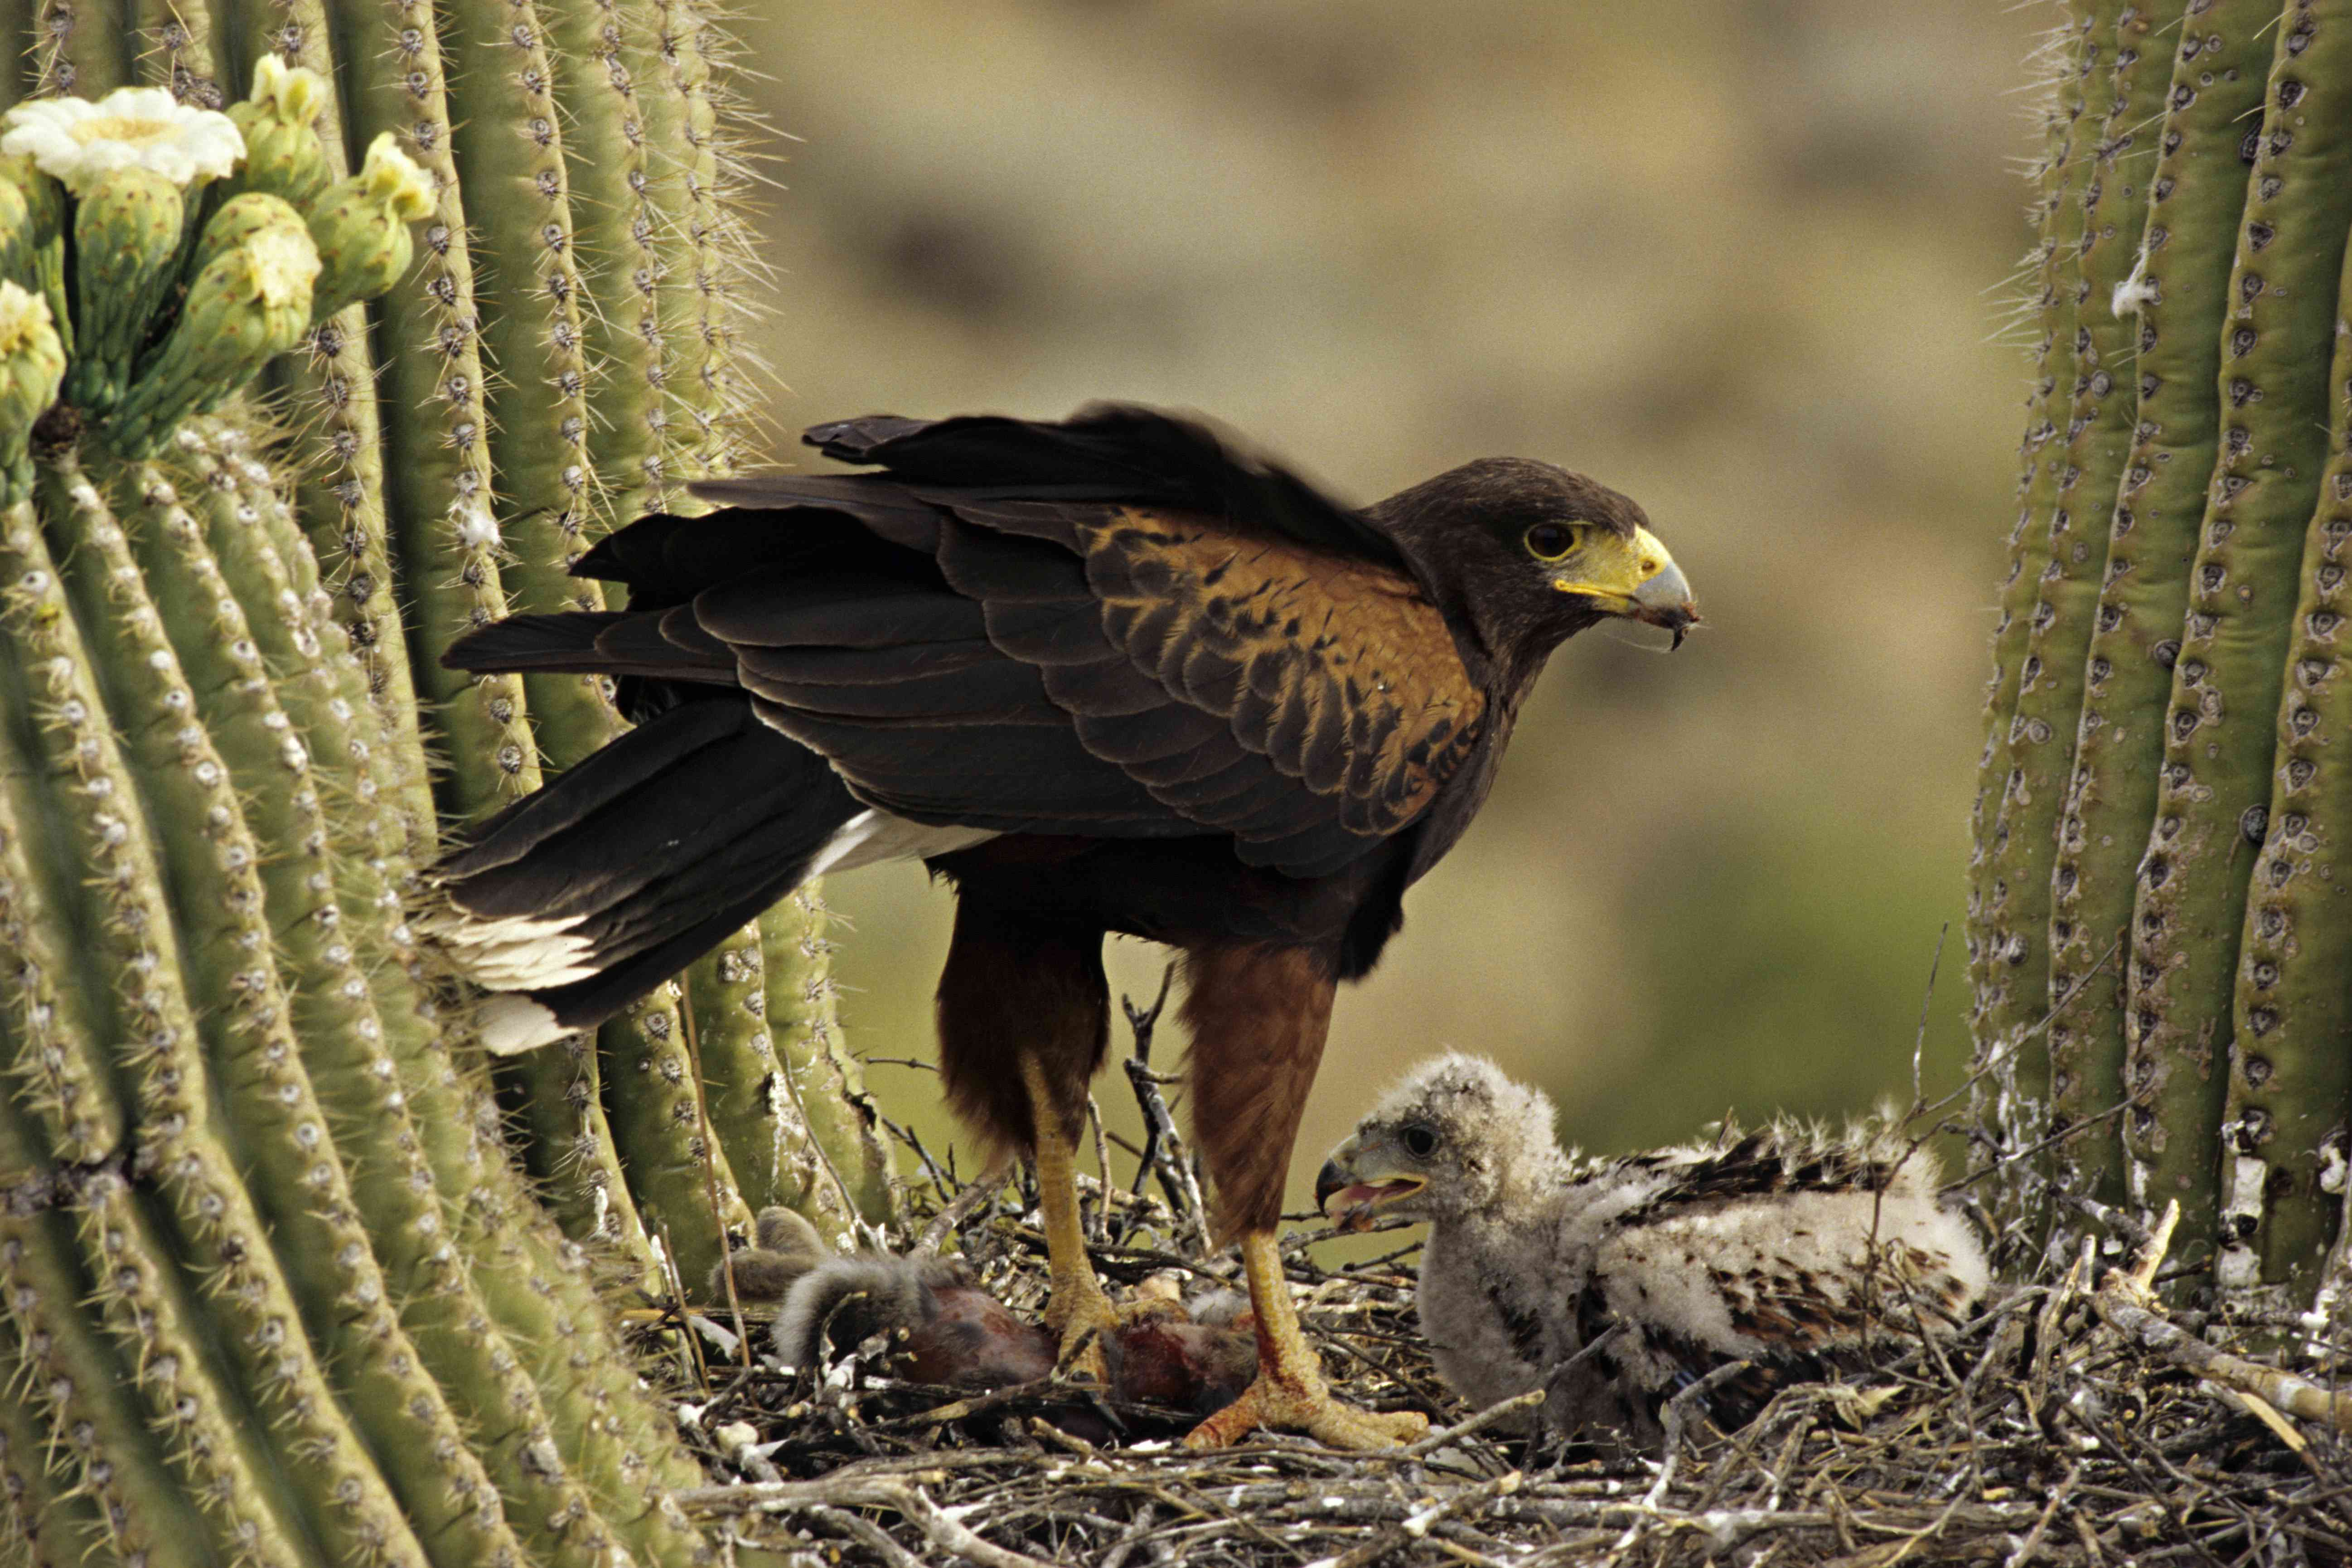 Harris Hawk, Parabuteo unicinctus, and chicks on nest in Saguaro cactus, Sonoran Desert, Arizona, USA